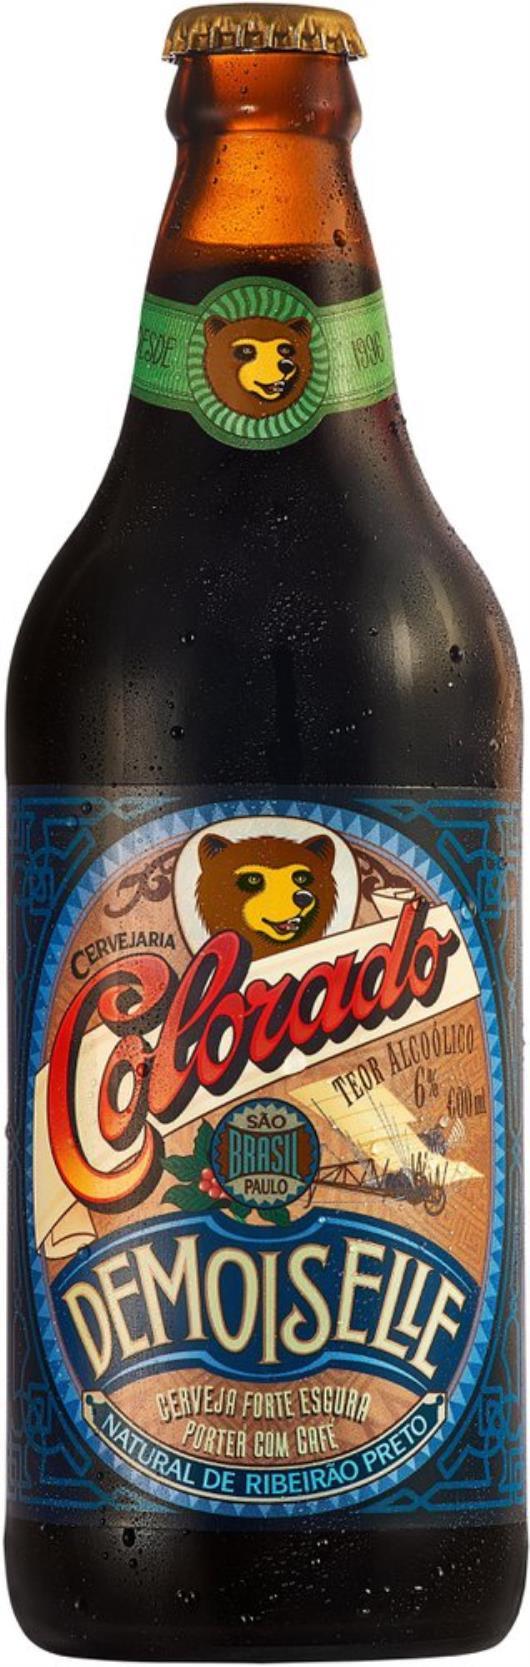 Cerveja COLORADO DEMOISELLE 600 ML Garrafa - Imagem em destaque